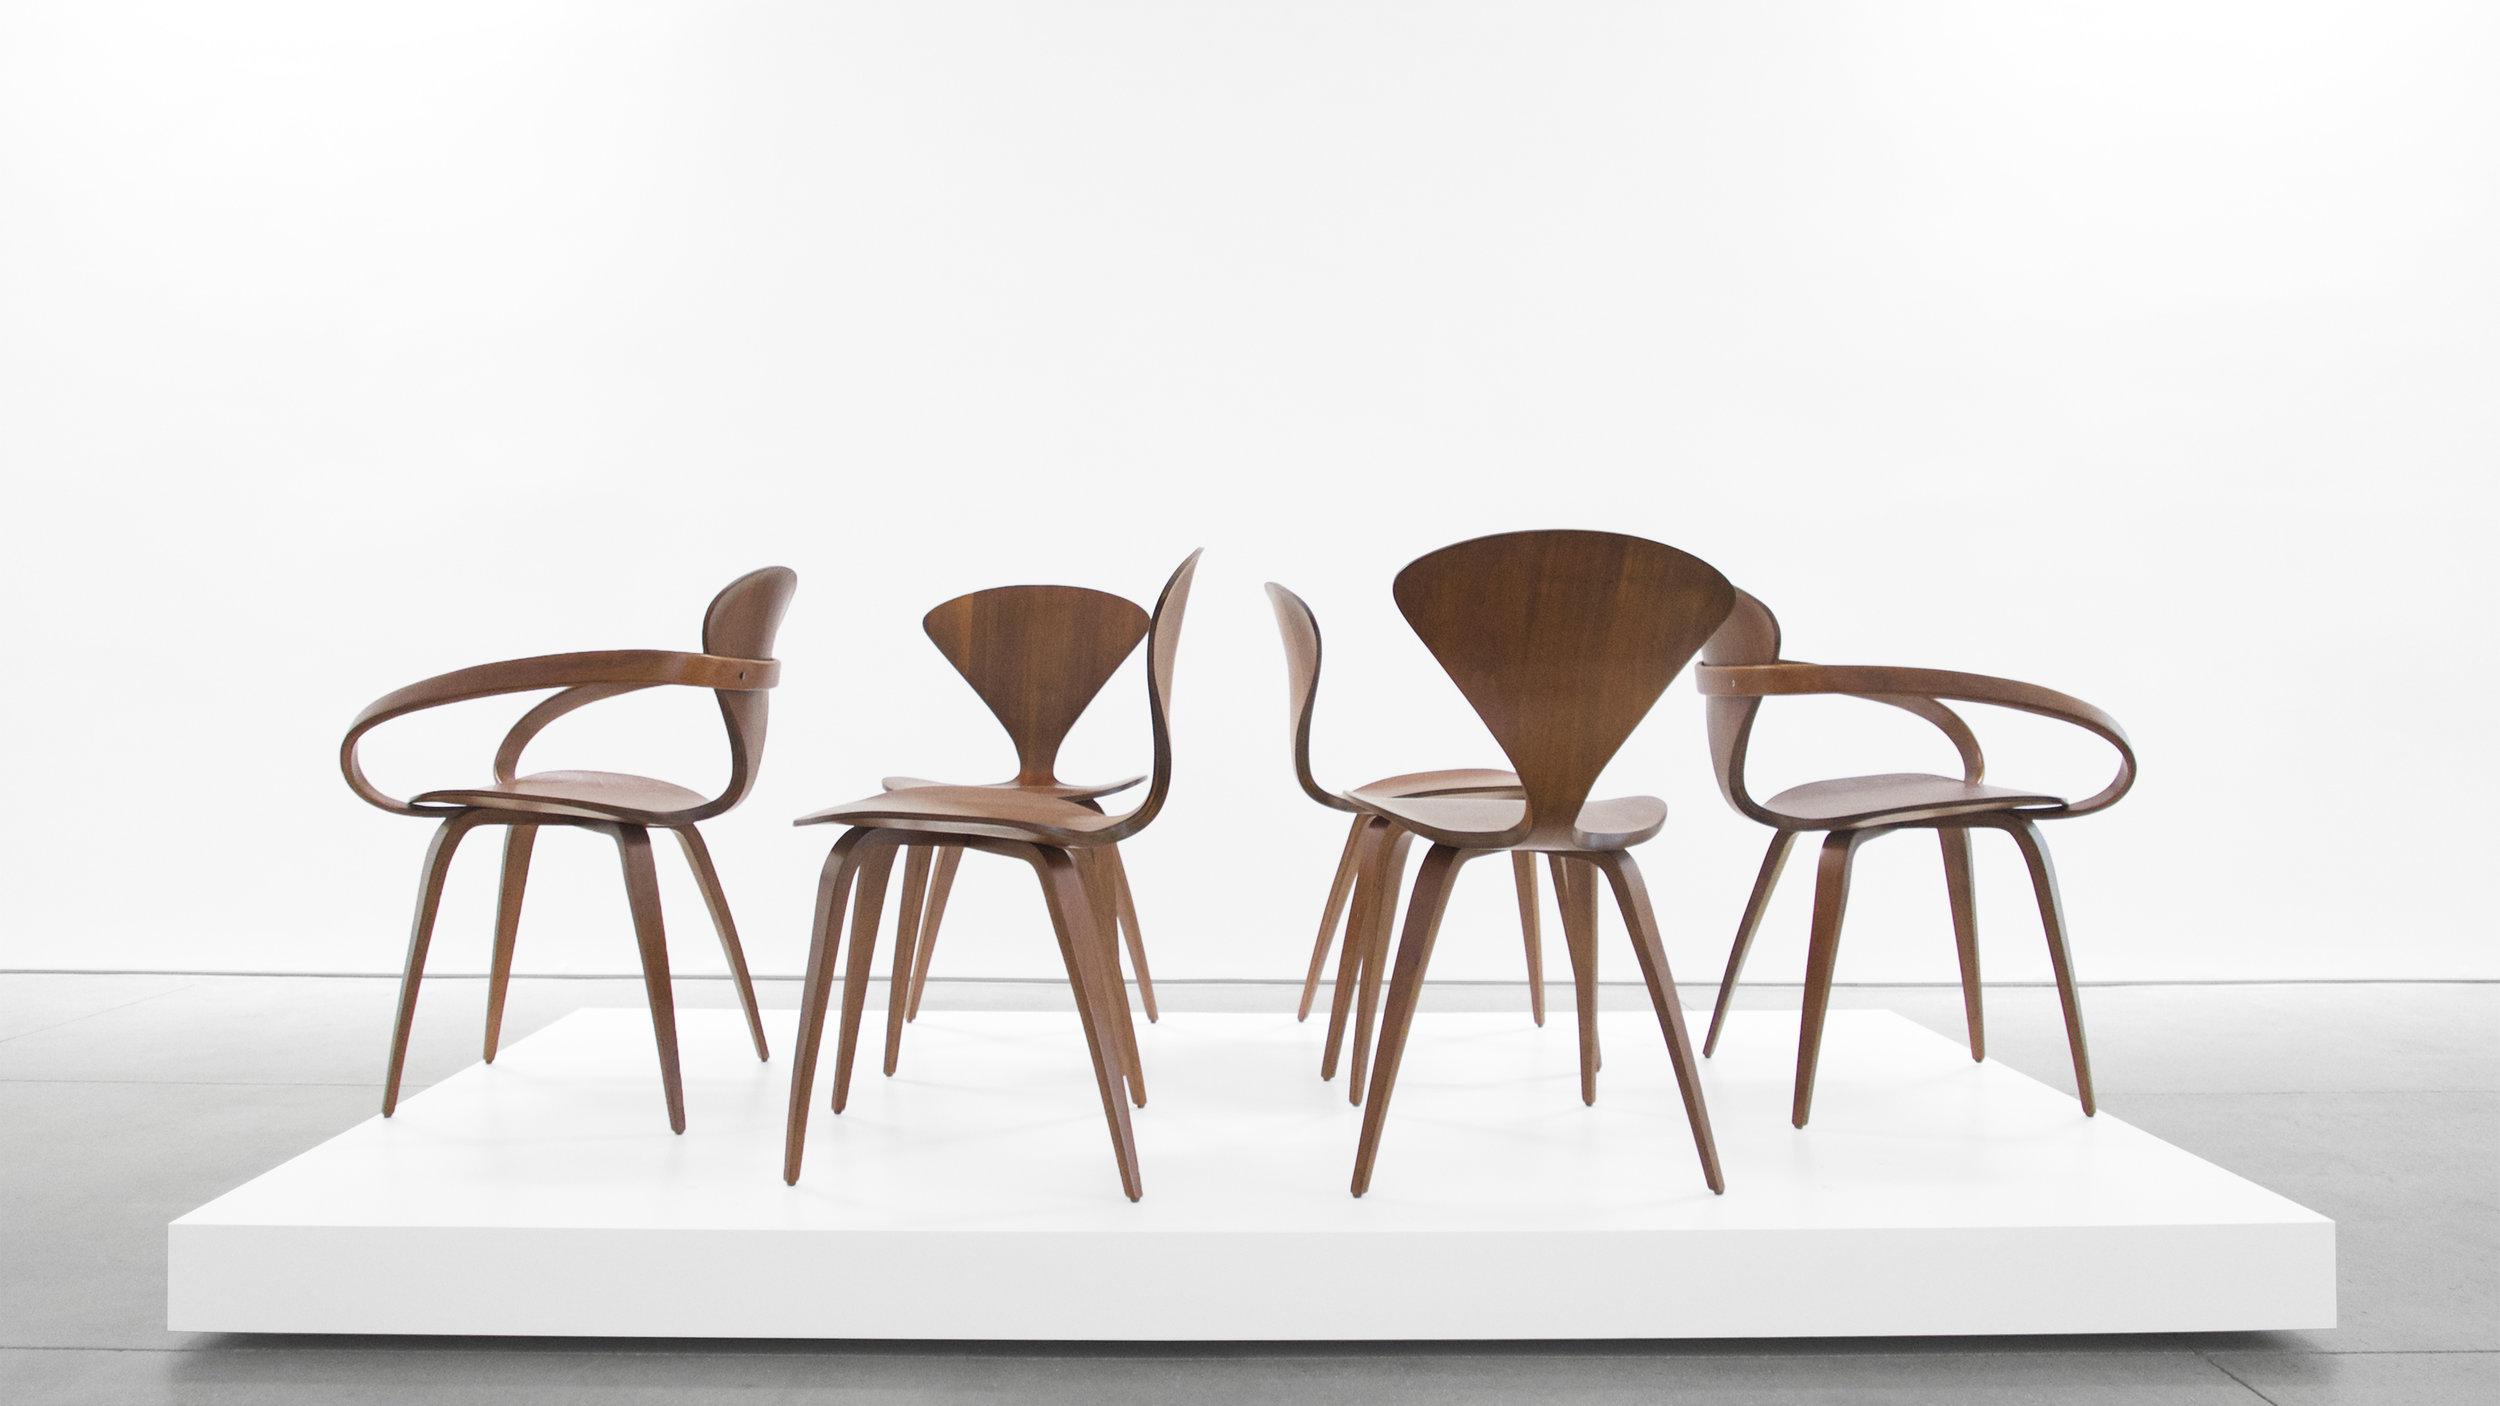 2. Norman Cherner, Pretzel Chairs, c. 1958, walnut, (4) 31H x 17W x 18.5 inches (2) 31H x 26W x 19D inches.jpg